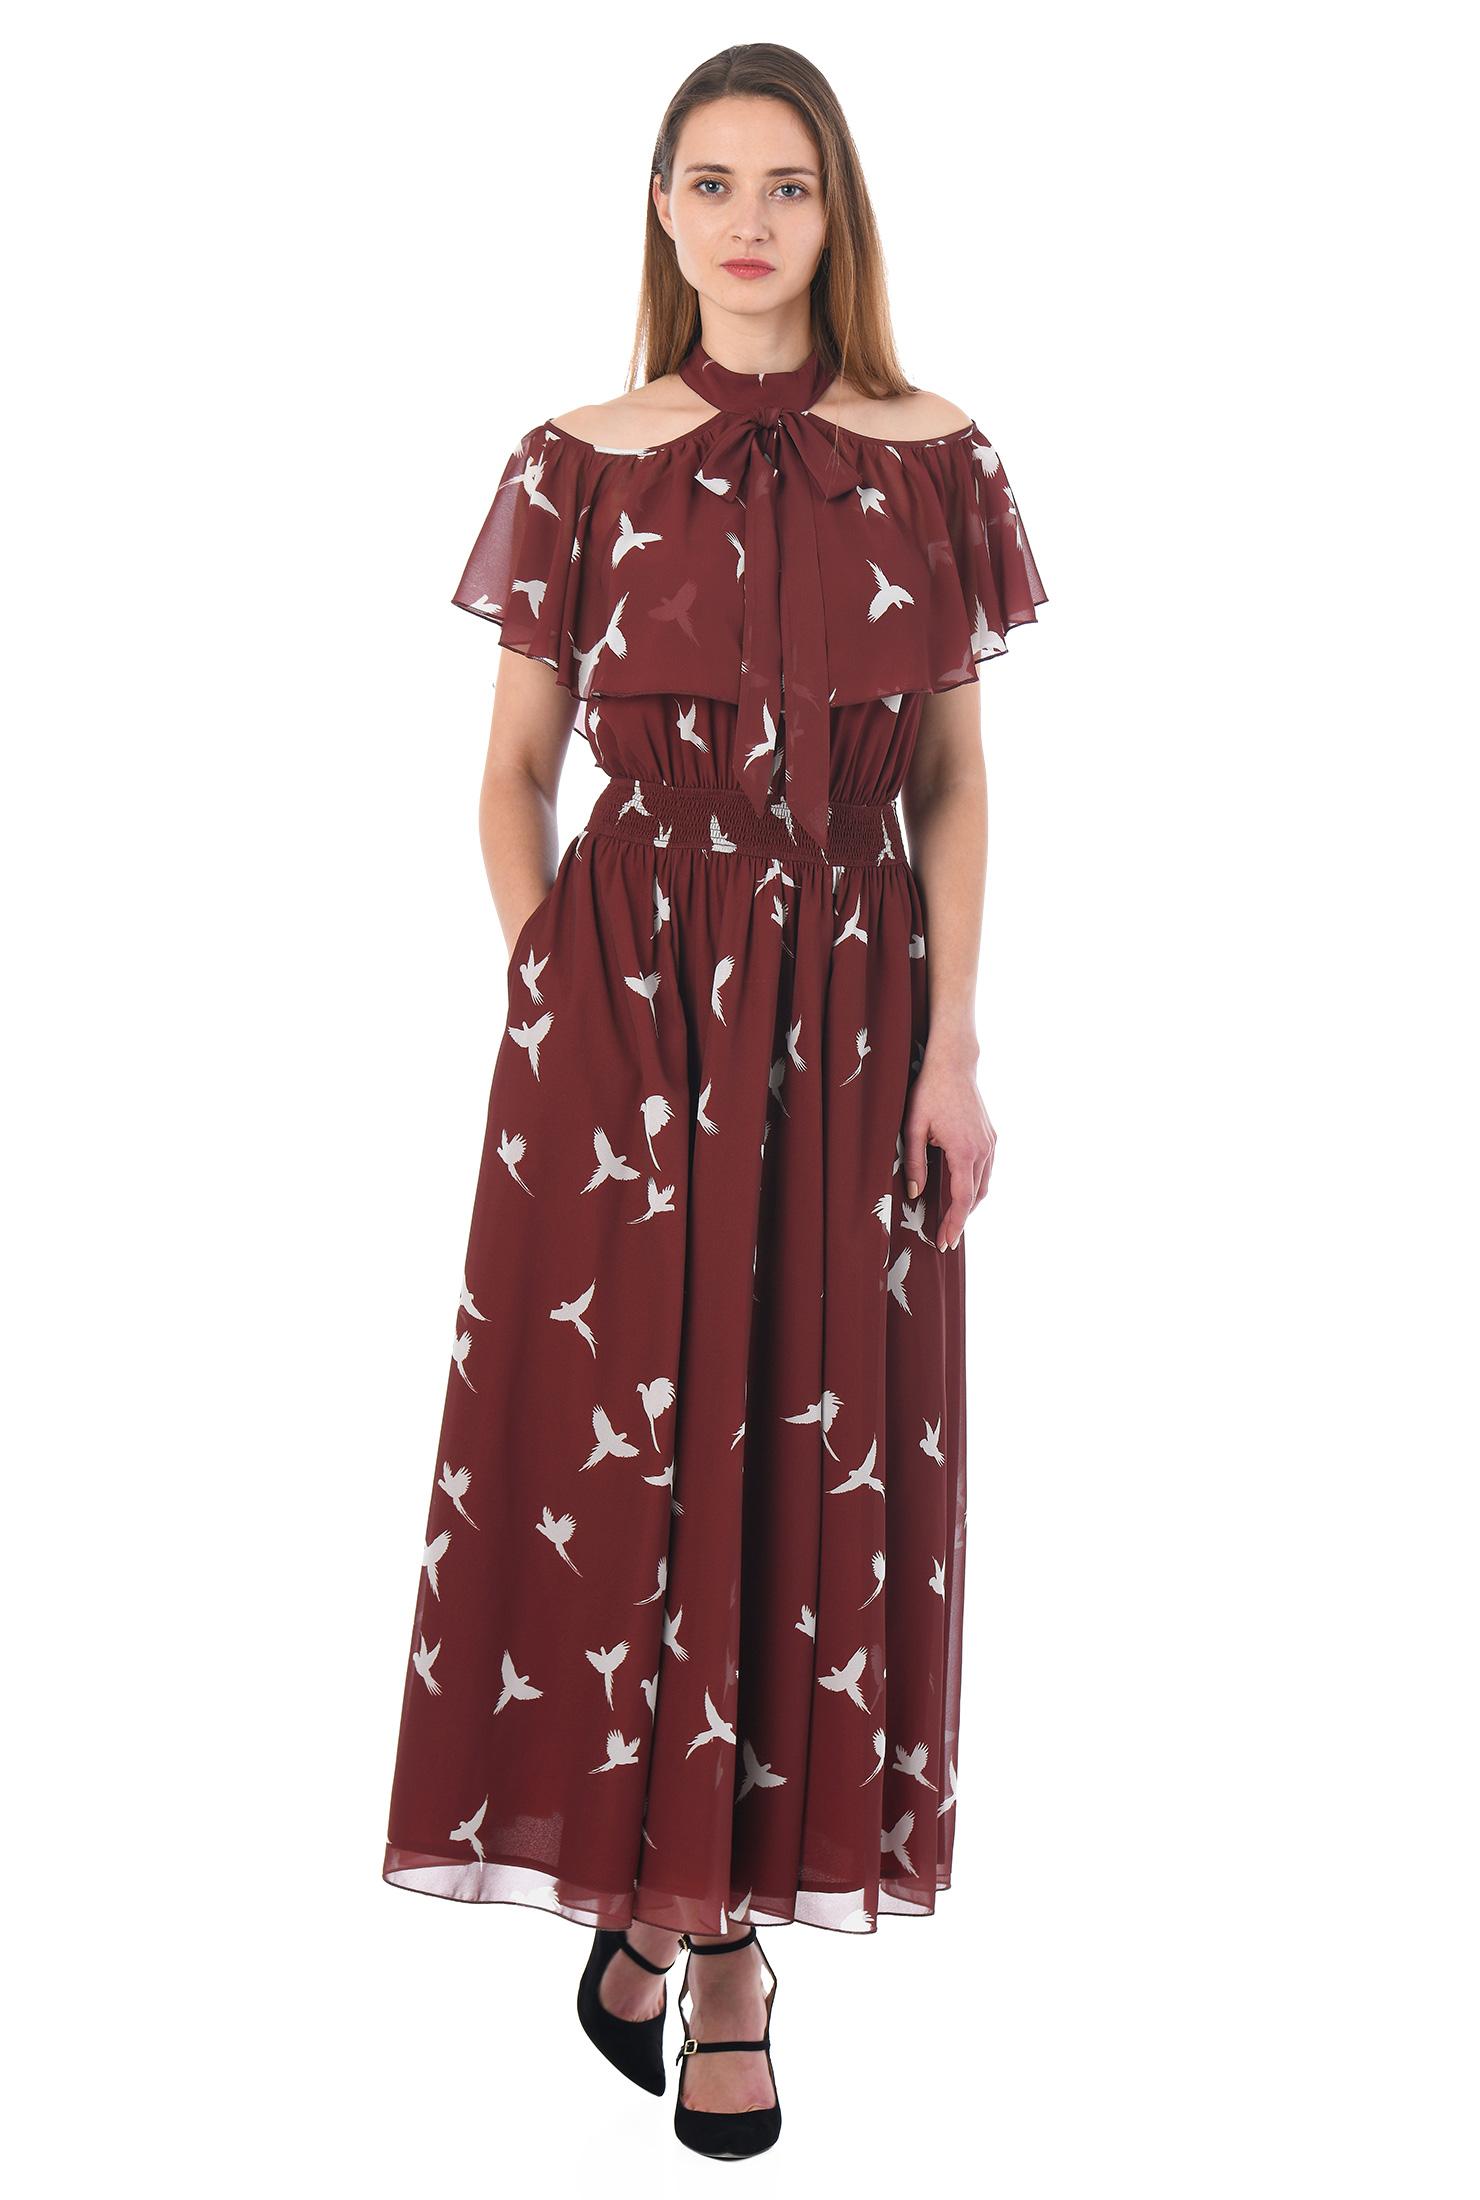 eShakti Women's Ruffle cold shoulder bird print georgette dress CL0053107